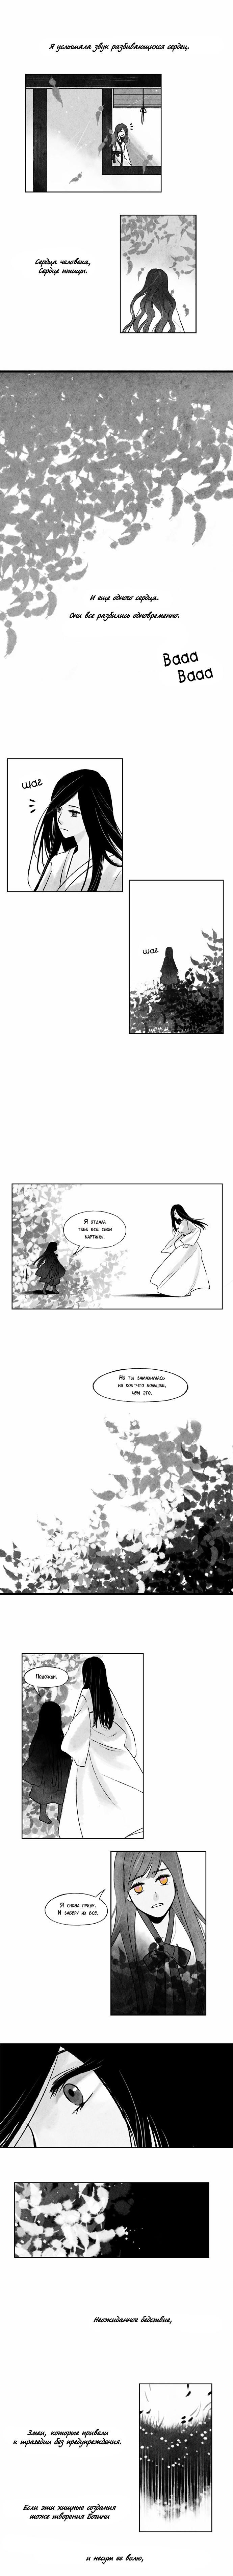 https://r1.ninemanga.com/comics/pic2/39/22503/416369/1532884233353.jpg Page 2